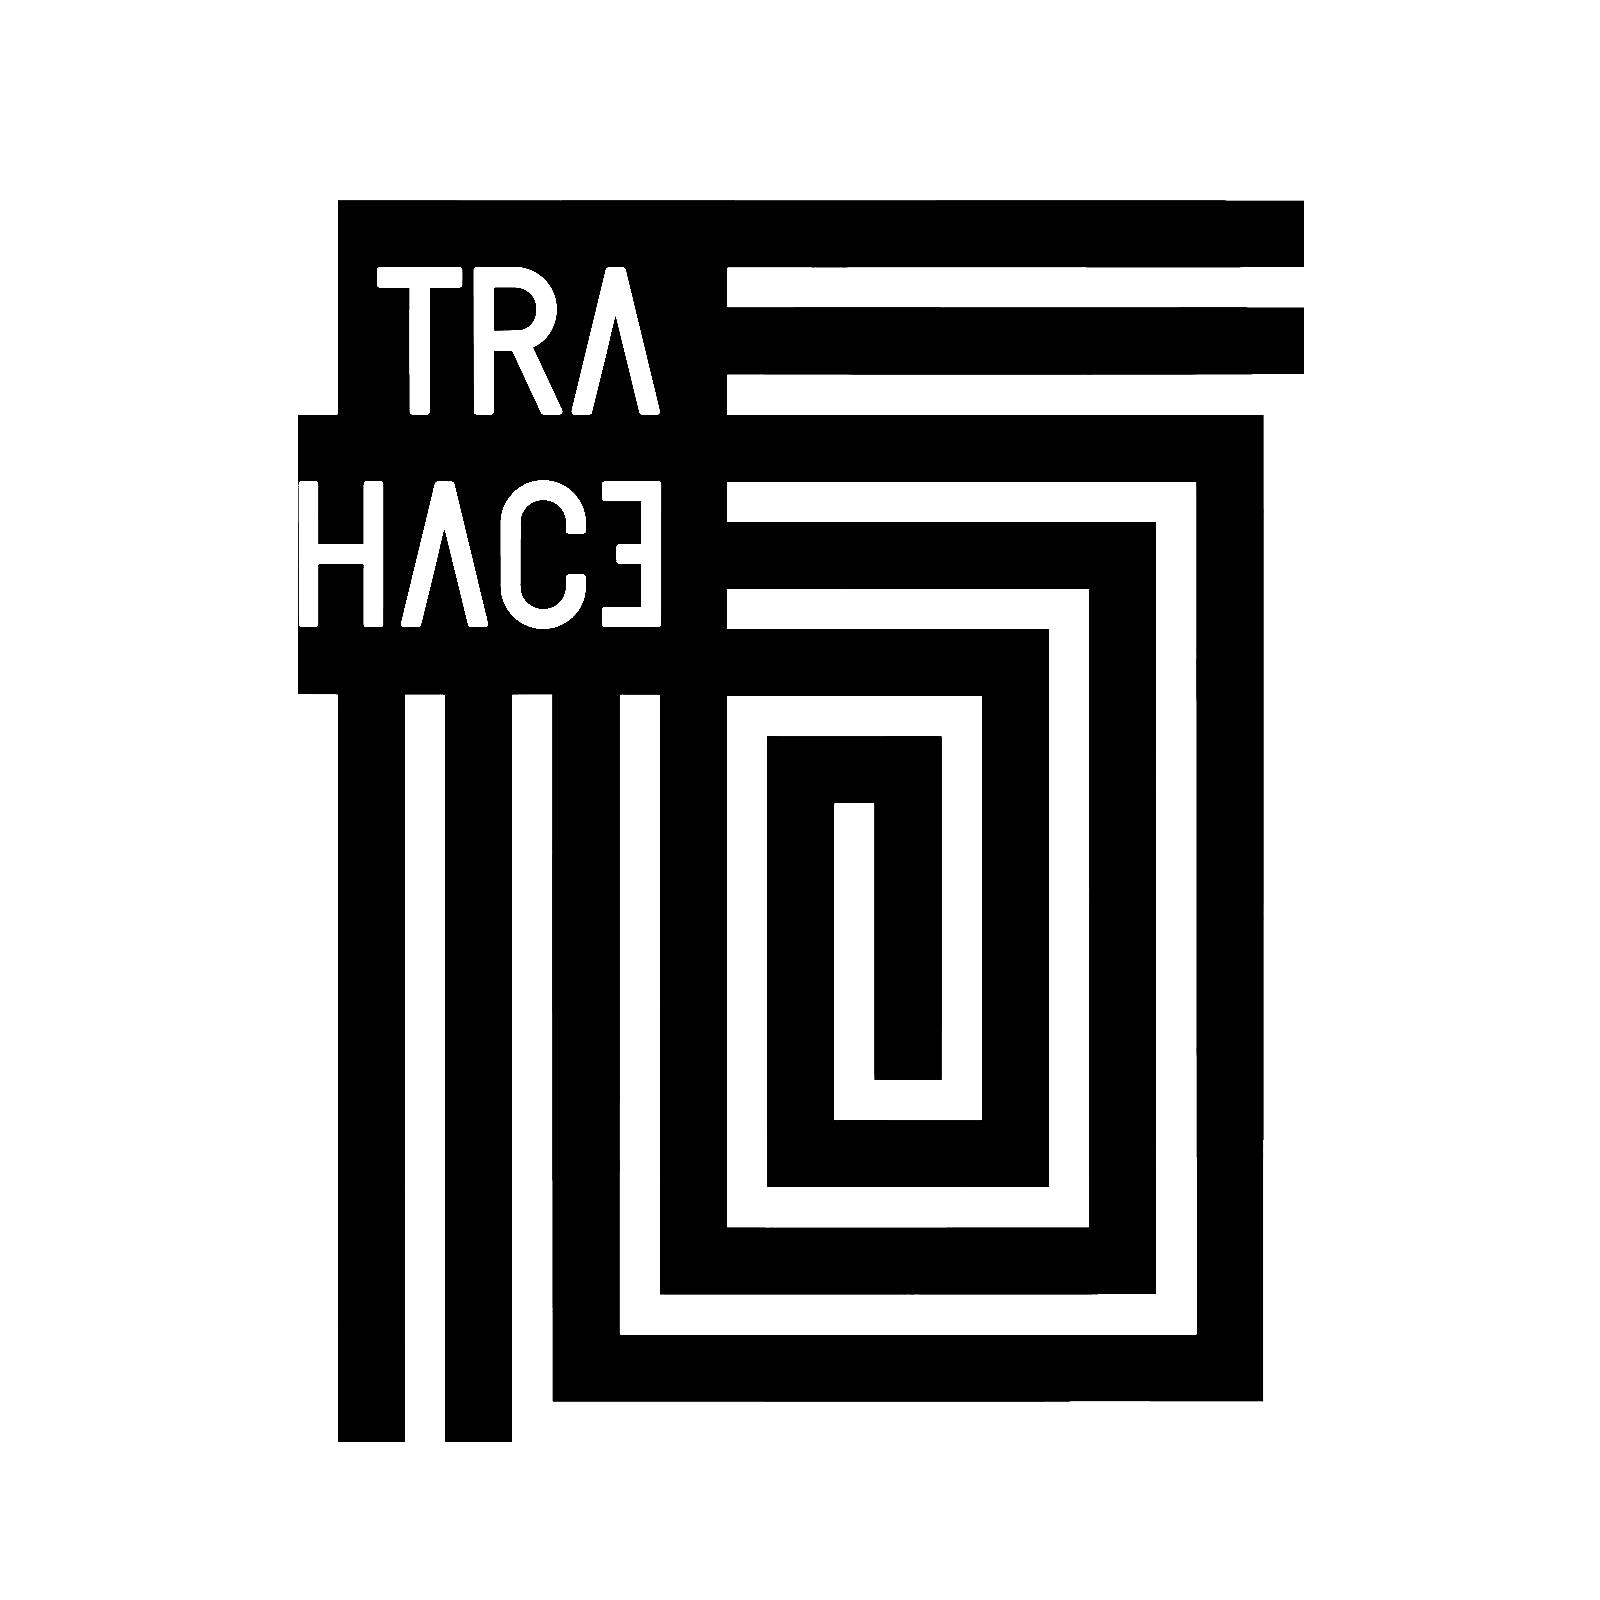 TRAHACE-LOGO  (white)(bem) copie.png